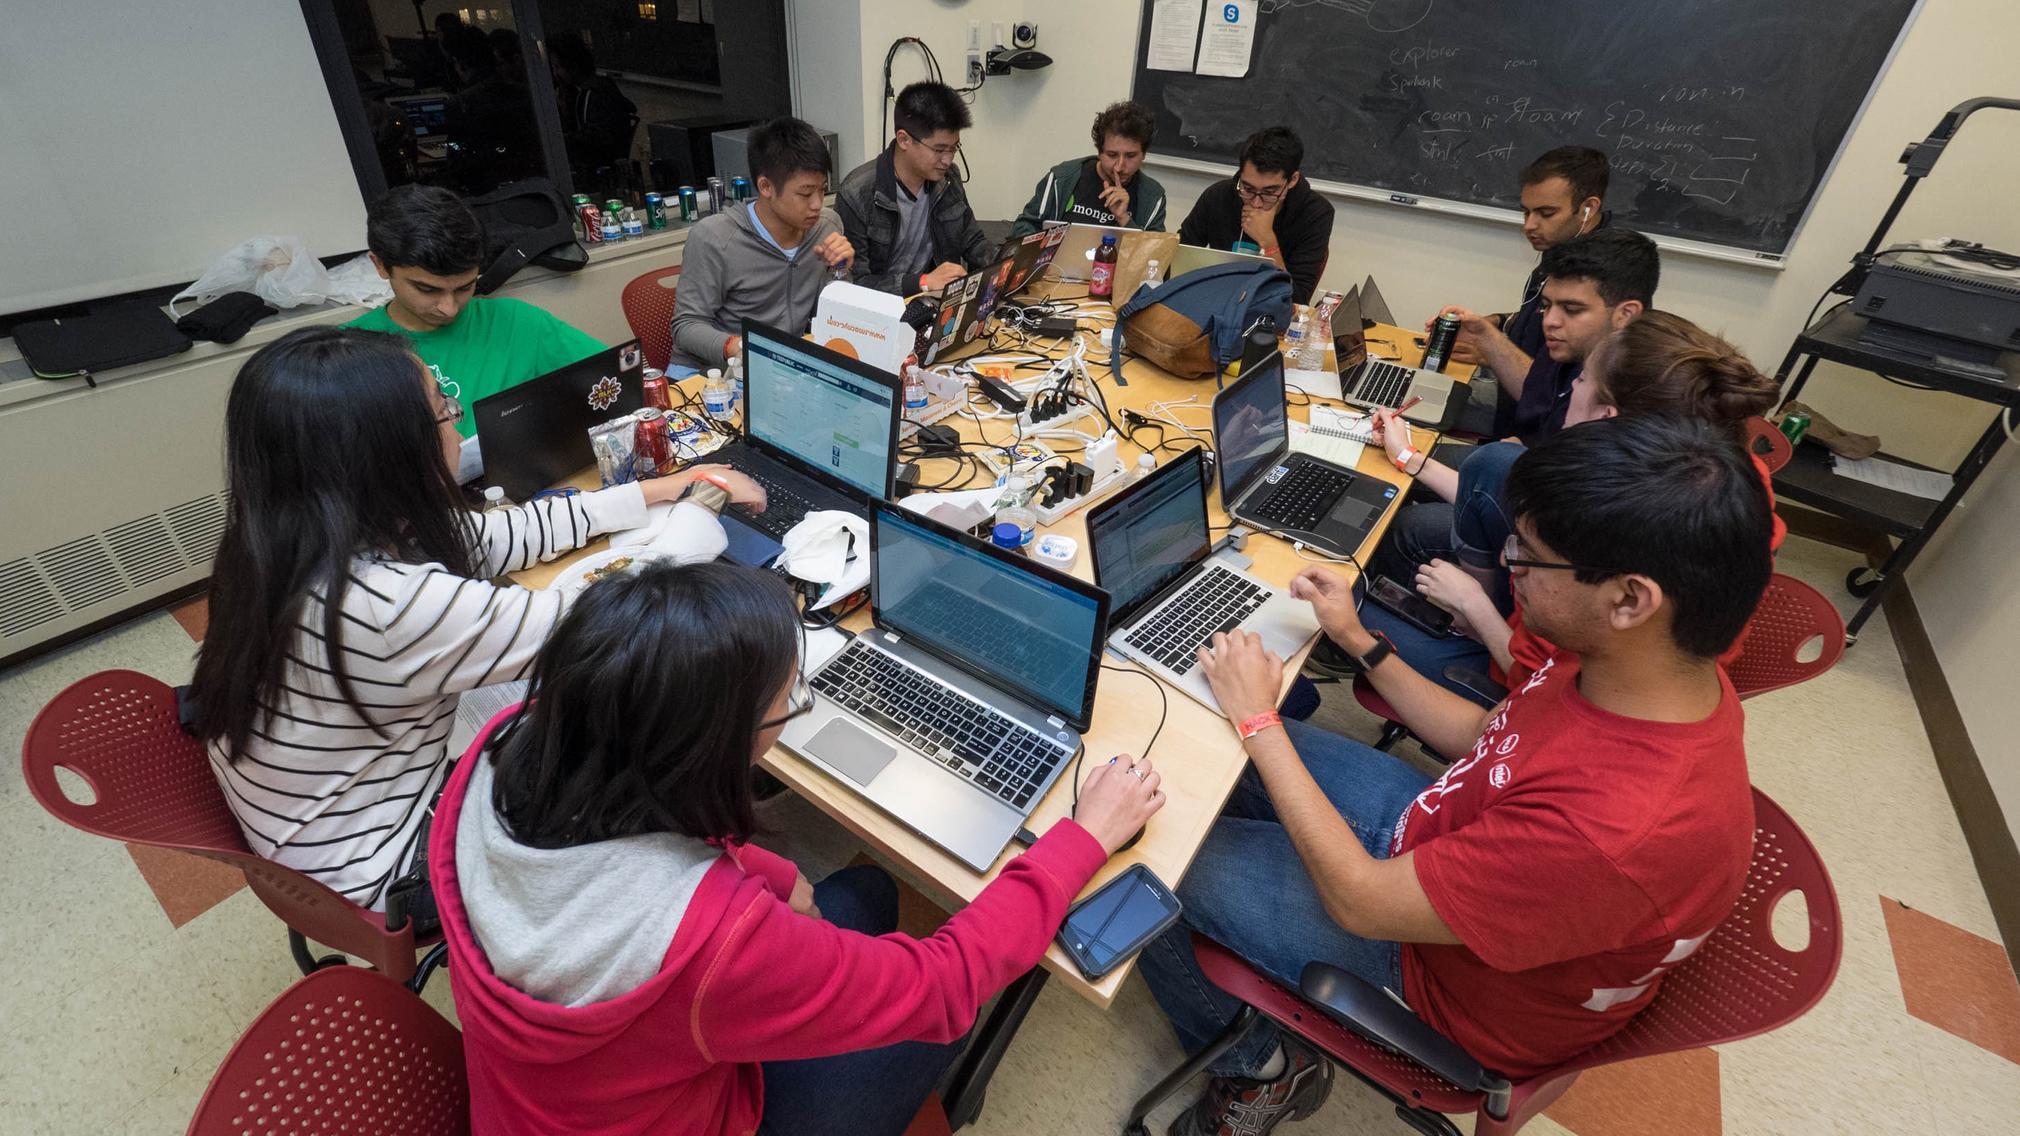 Hackathon New York, Fall 2015